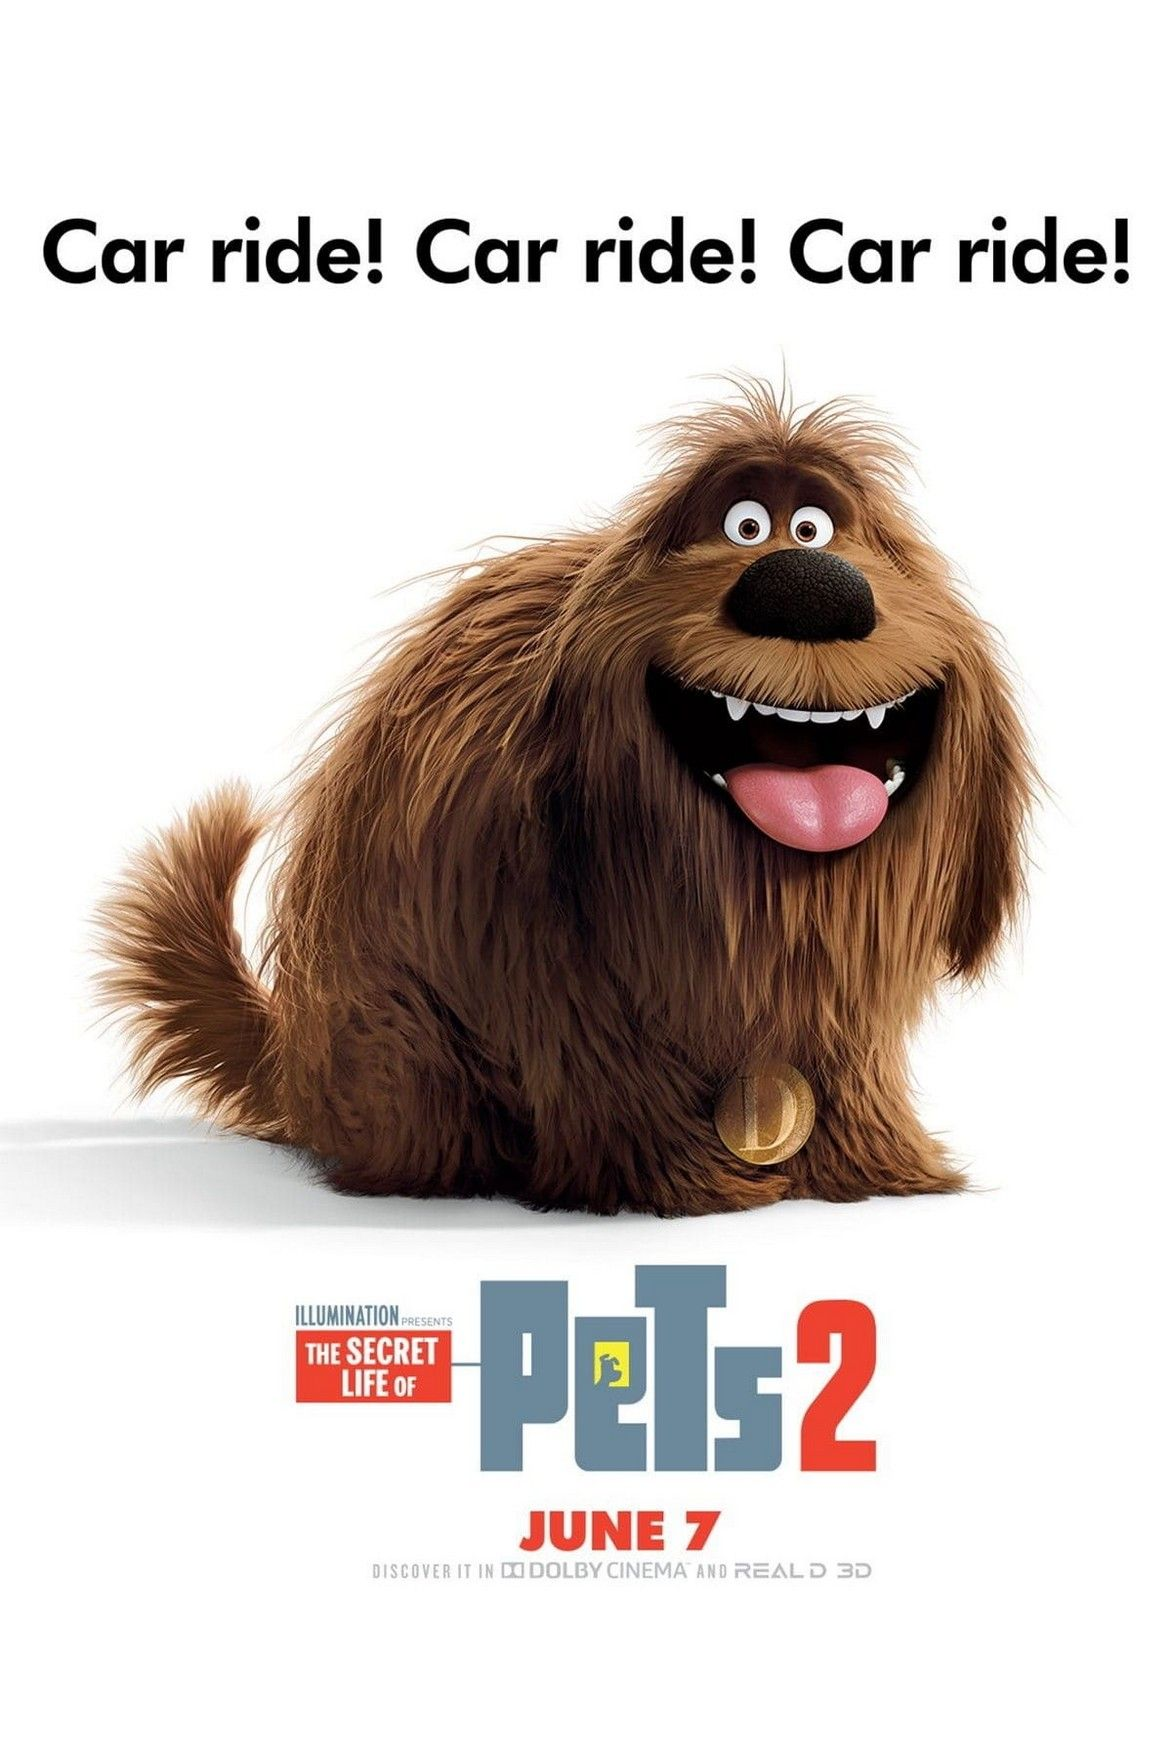 Ver Pelicula Completa De The Secret Life Of Pets 2 Mascotas 2 2019 The Secret Life Of Pets 2 Mascotas 2 Pelicul Secret Life Of Pets Secret Life The Secret